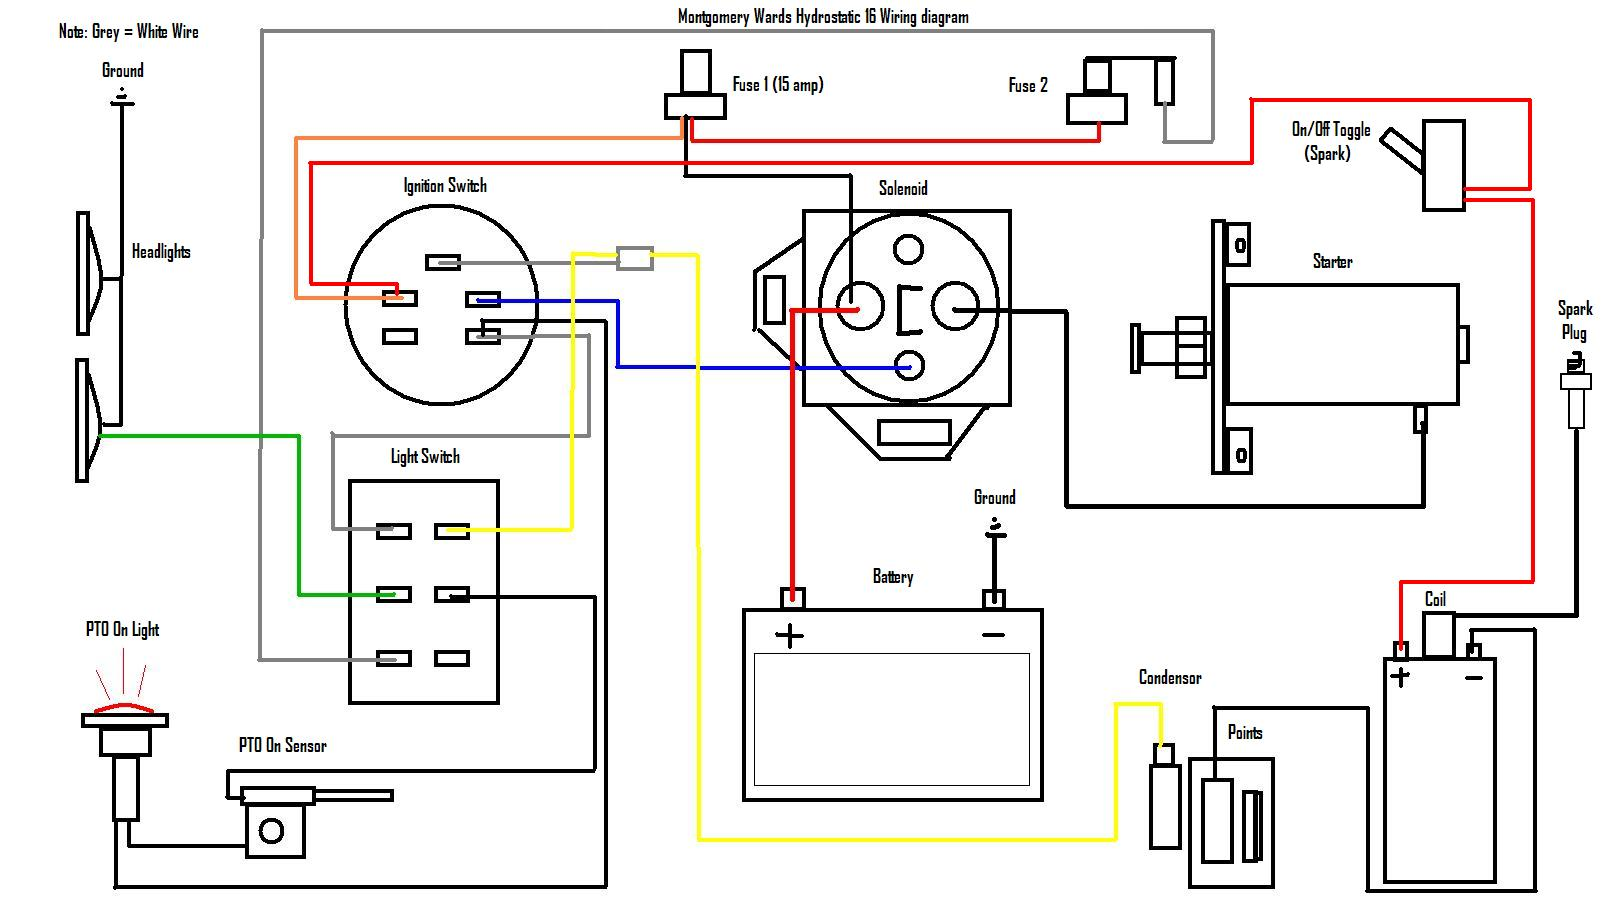 la145 wiring diagram john deere f710 wiring diagram john wiring diagrams john deere 5103 wiring schematic